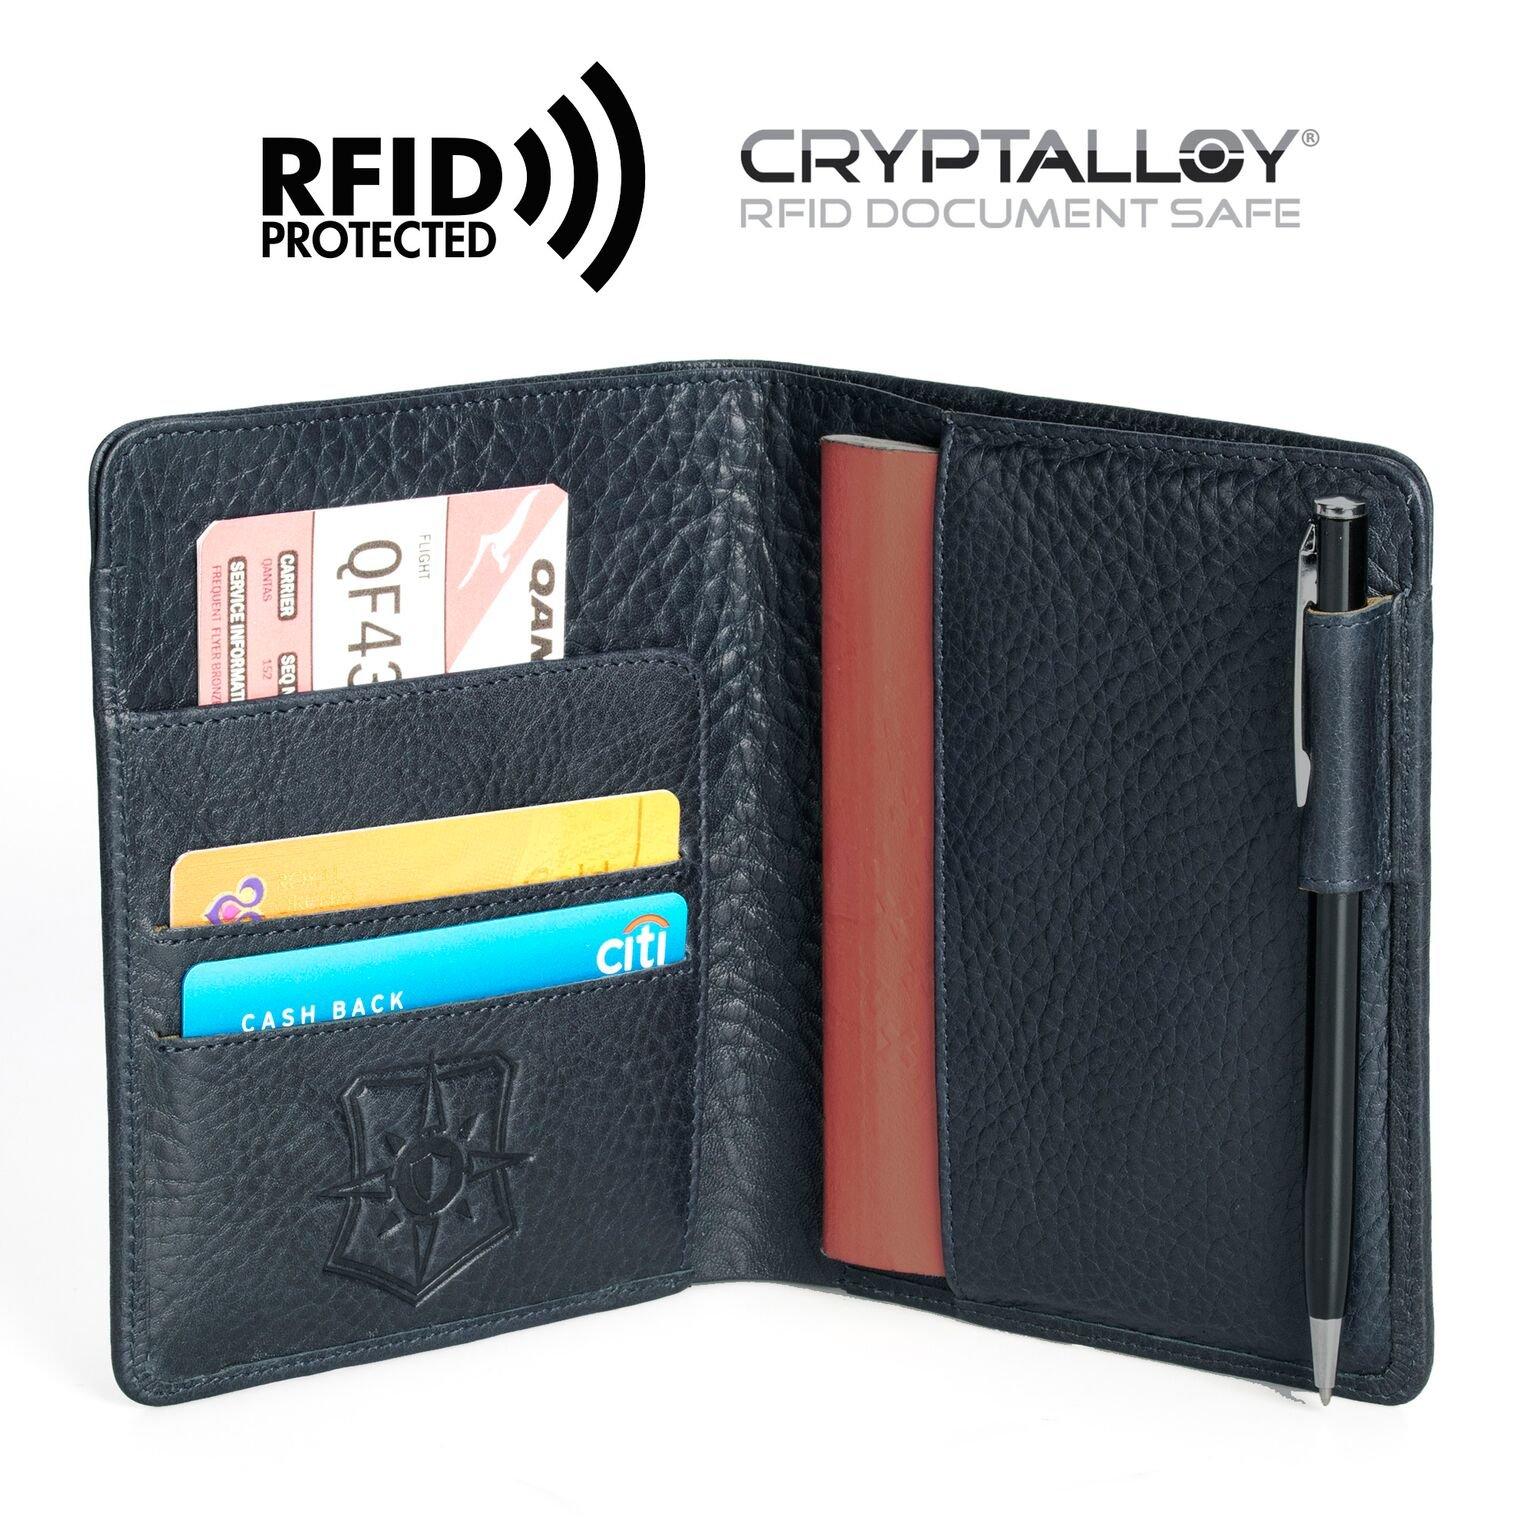 Pagalli Vincente Men Women Unisex Premium Genuine Leather RFID Blocking Pen Boarding Pass Credit Card ID Theft Protector Thin Slim Passport Travel Holder Wallet Wallets, Blue